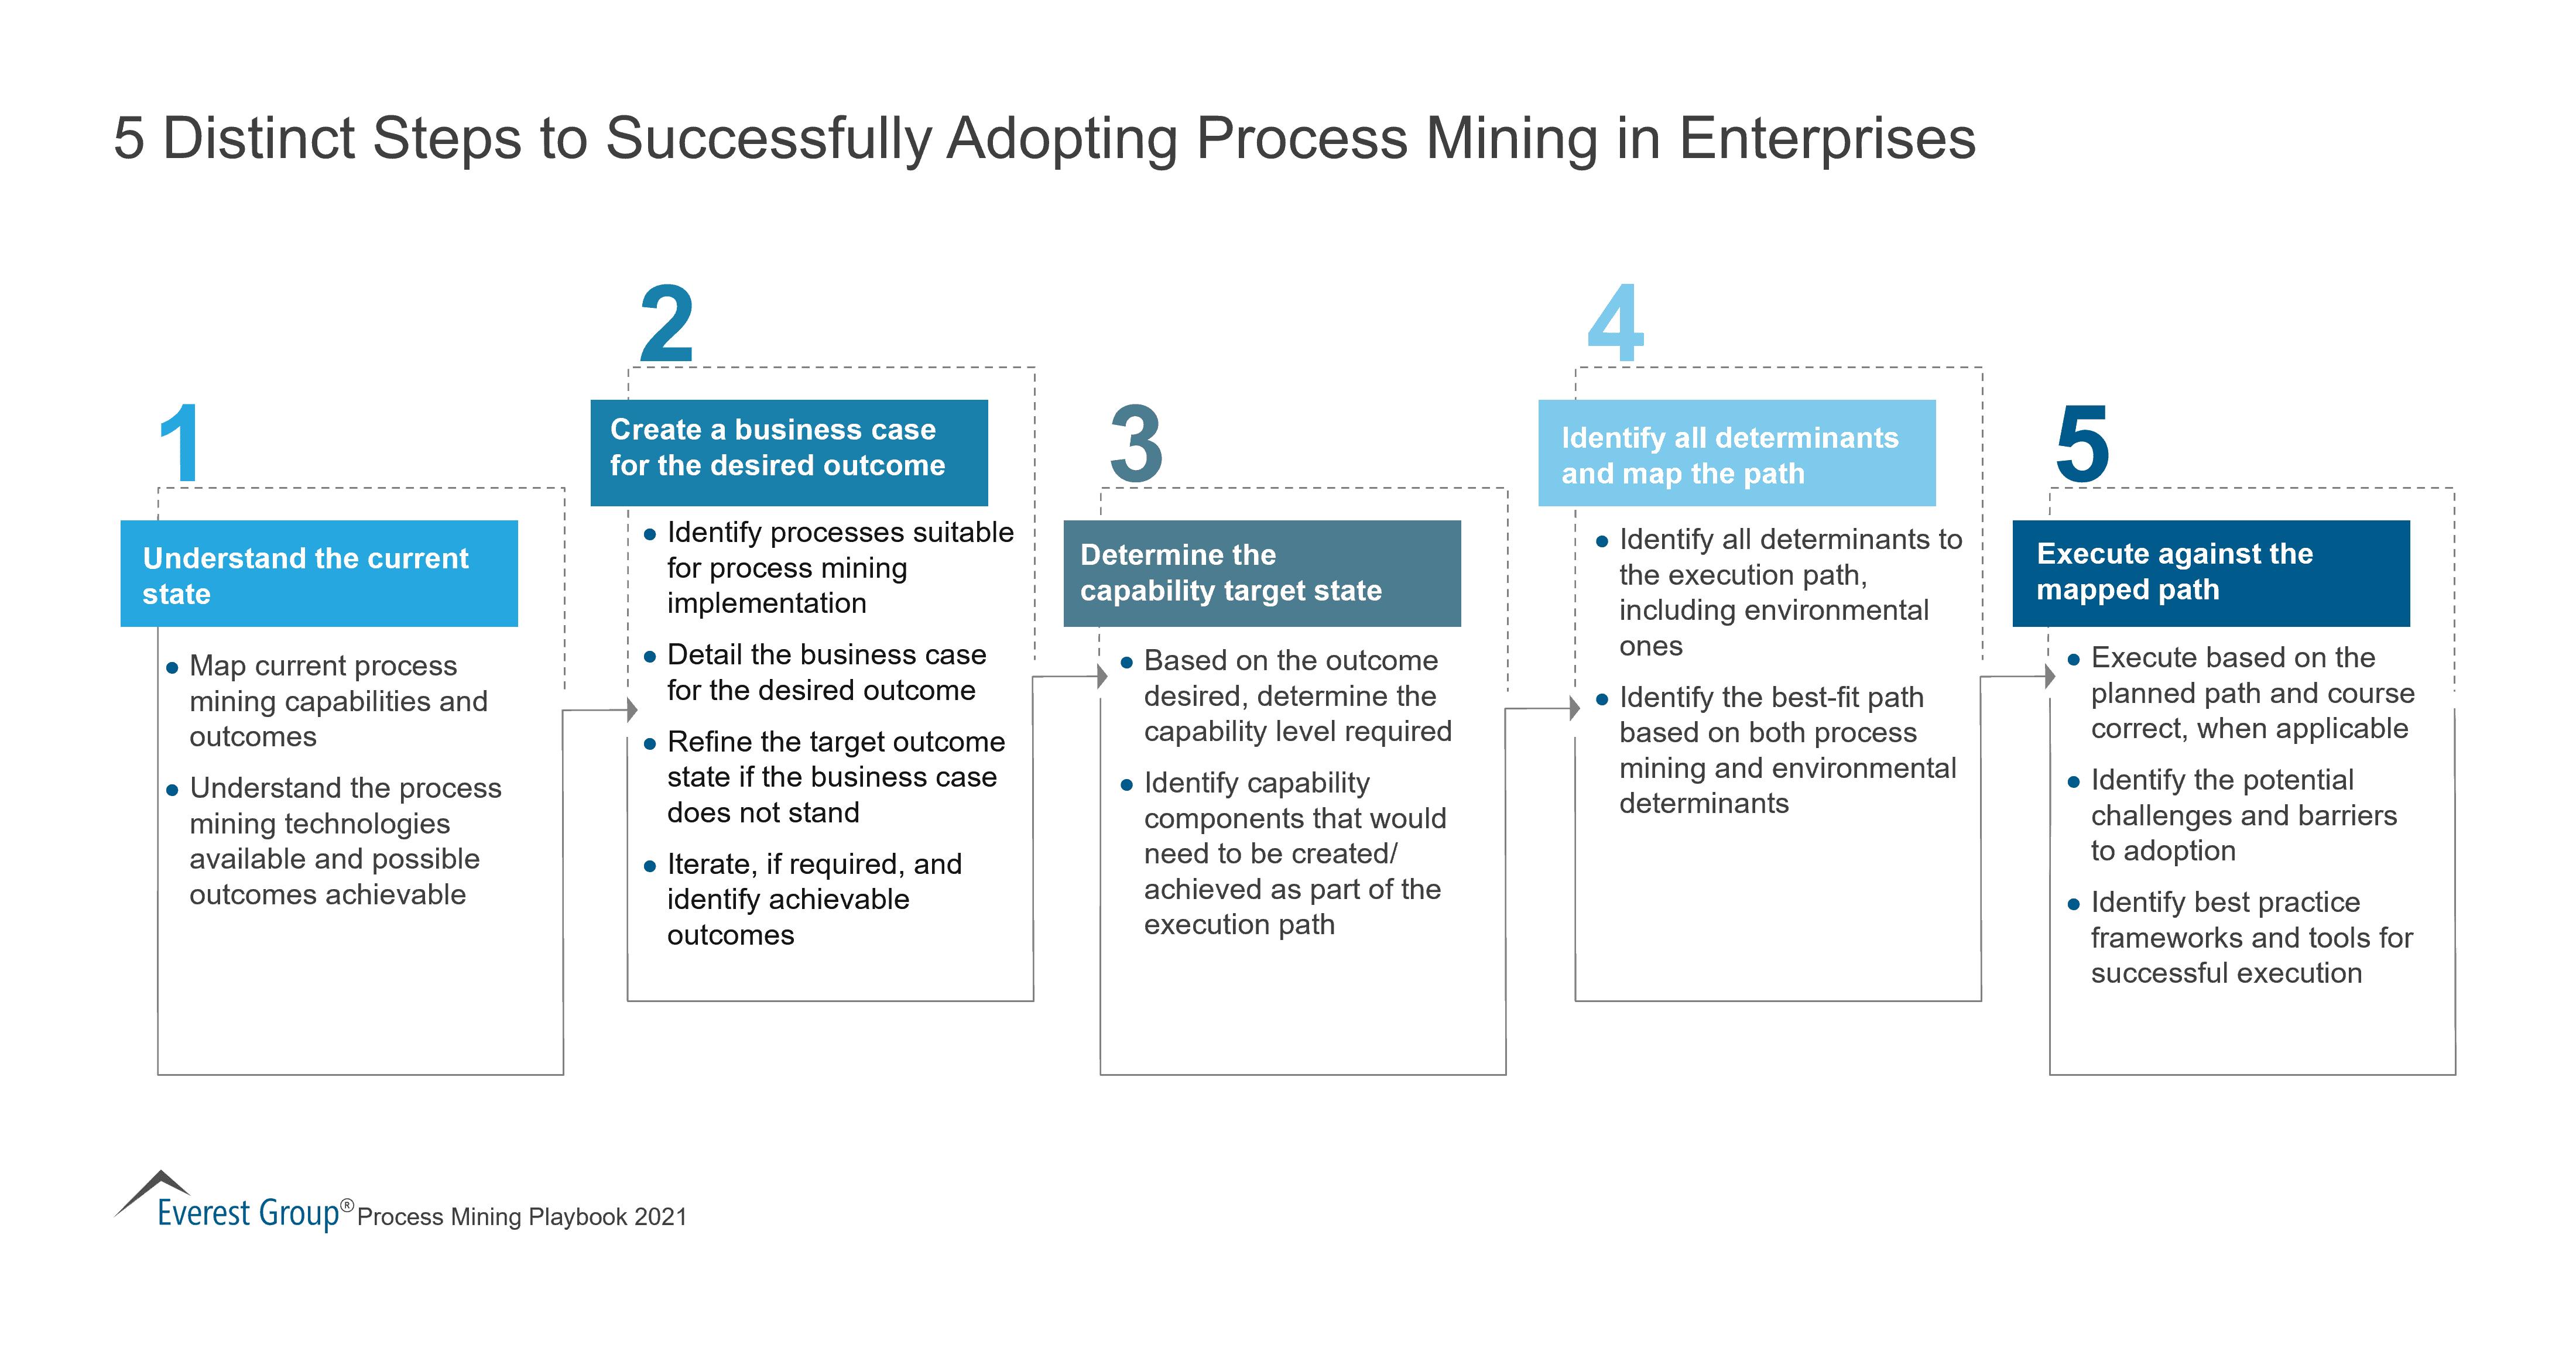 5 Distinct Steps to Successfully Adopting Process Mining in Enterprises